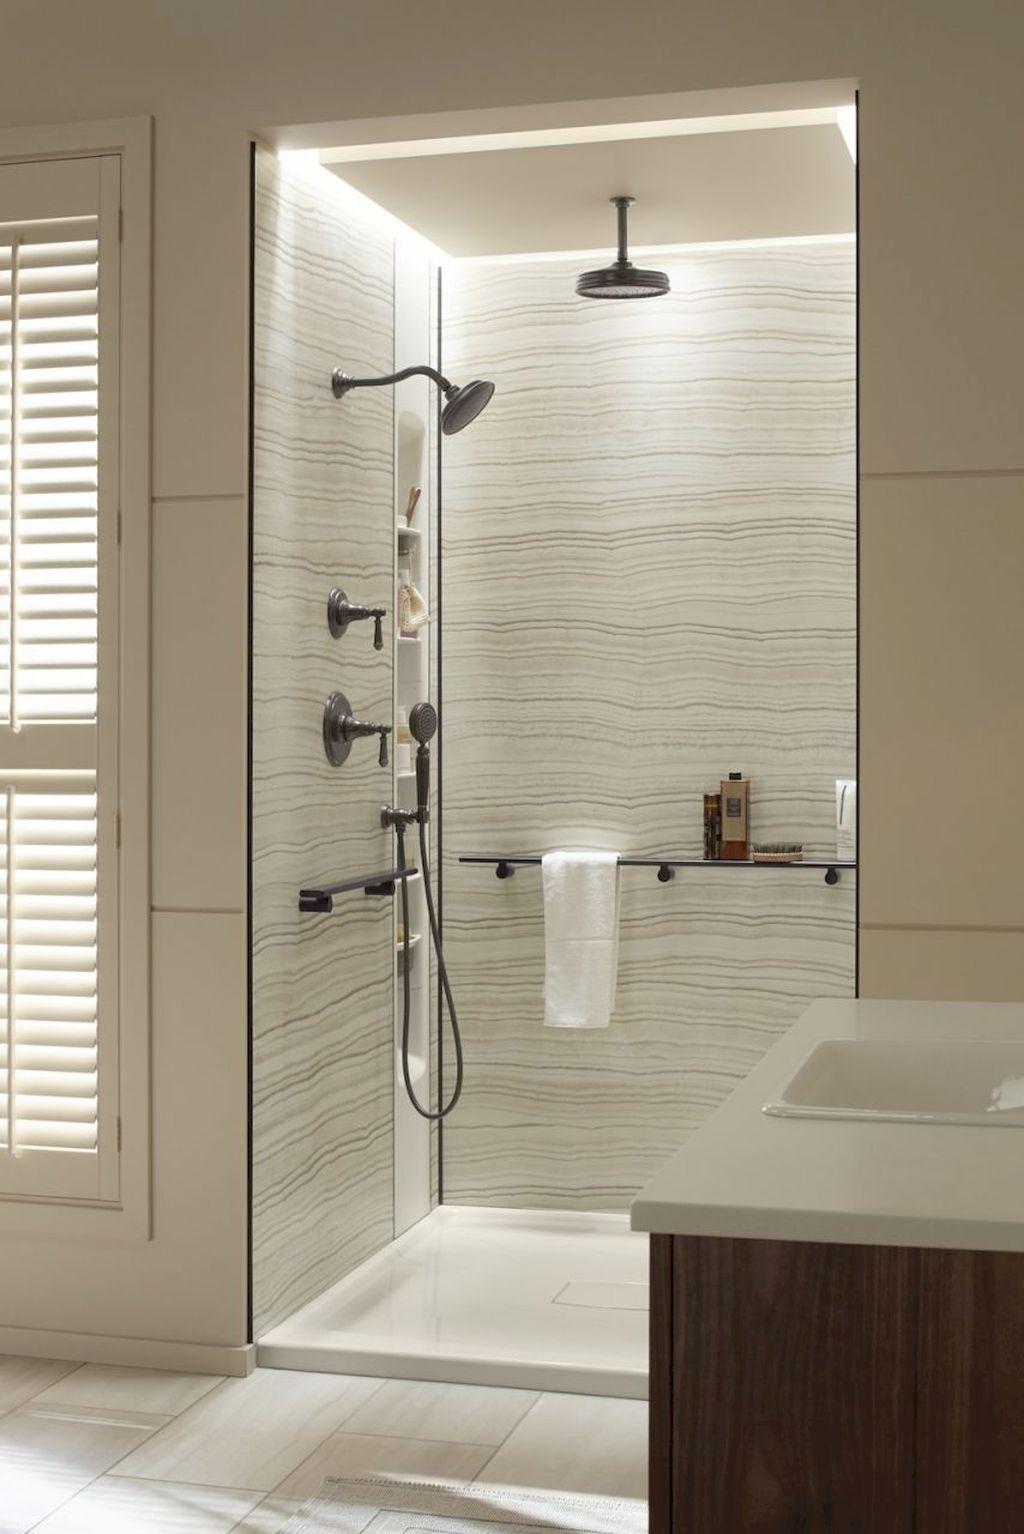 55 Cool Bathroom Shower Makeover Ideas | Decoracion para el hogar ...